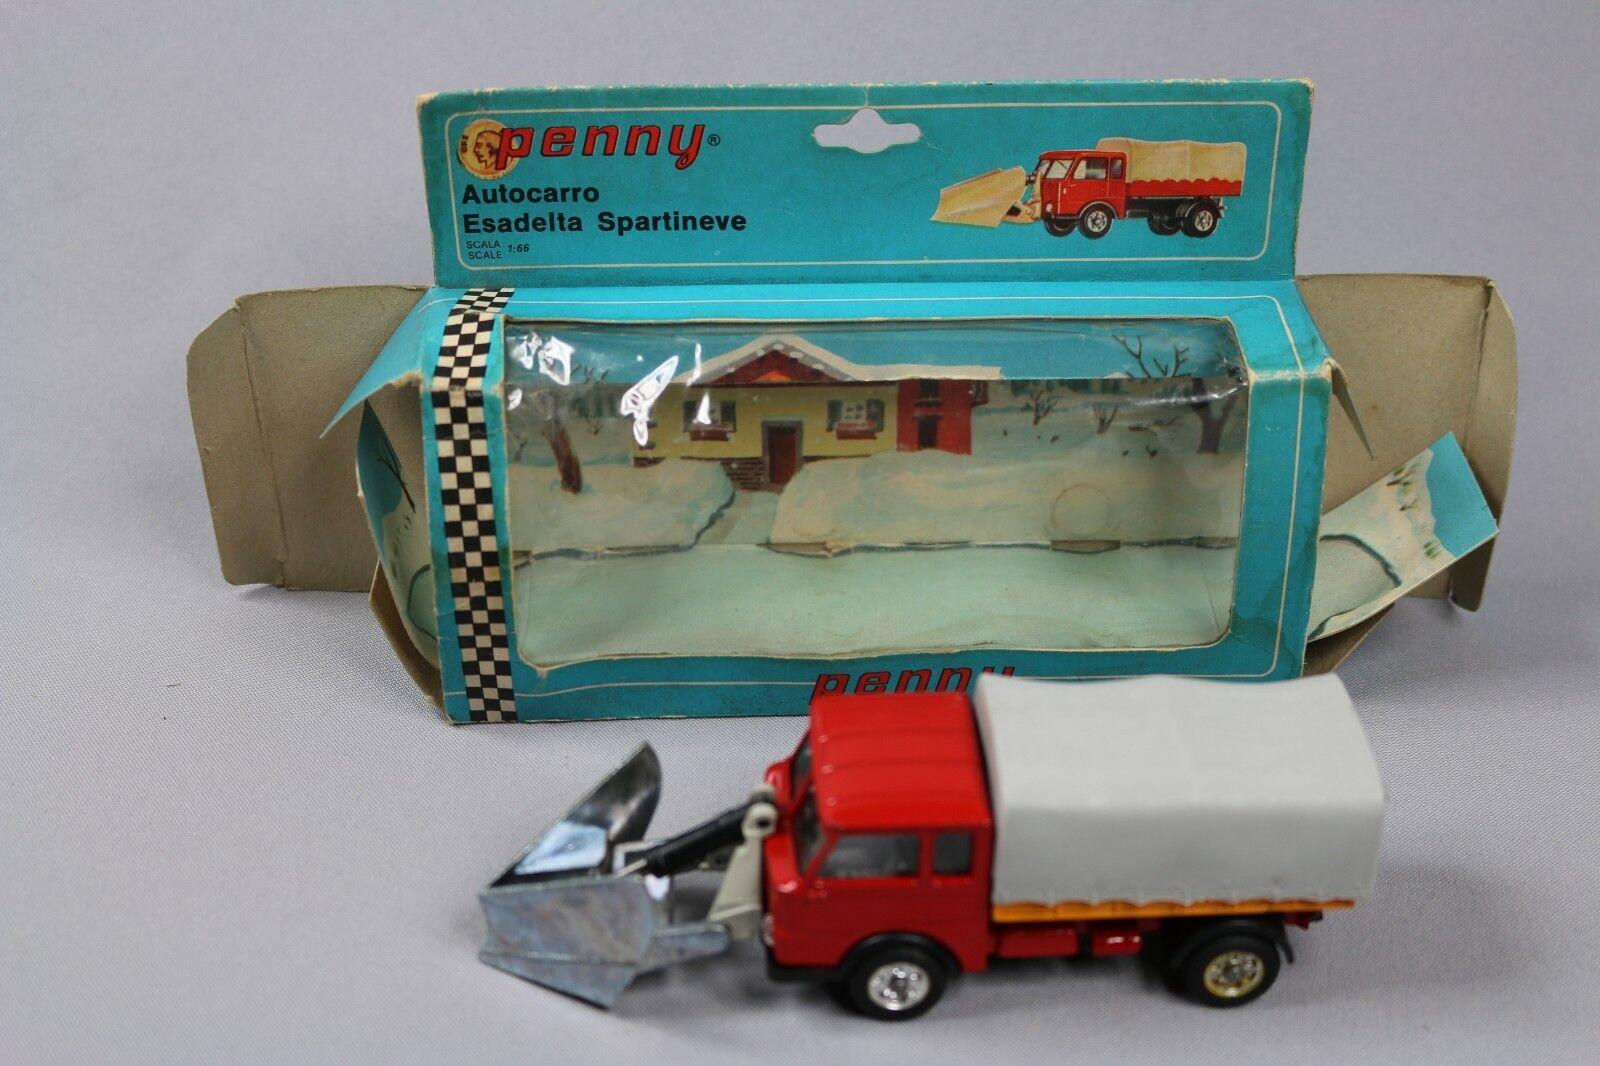 ZC1116 Penny 0 118 Camion Miniature 1 66 Esadelta Autocarro Spartineve